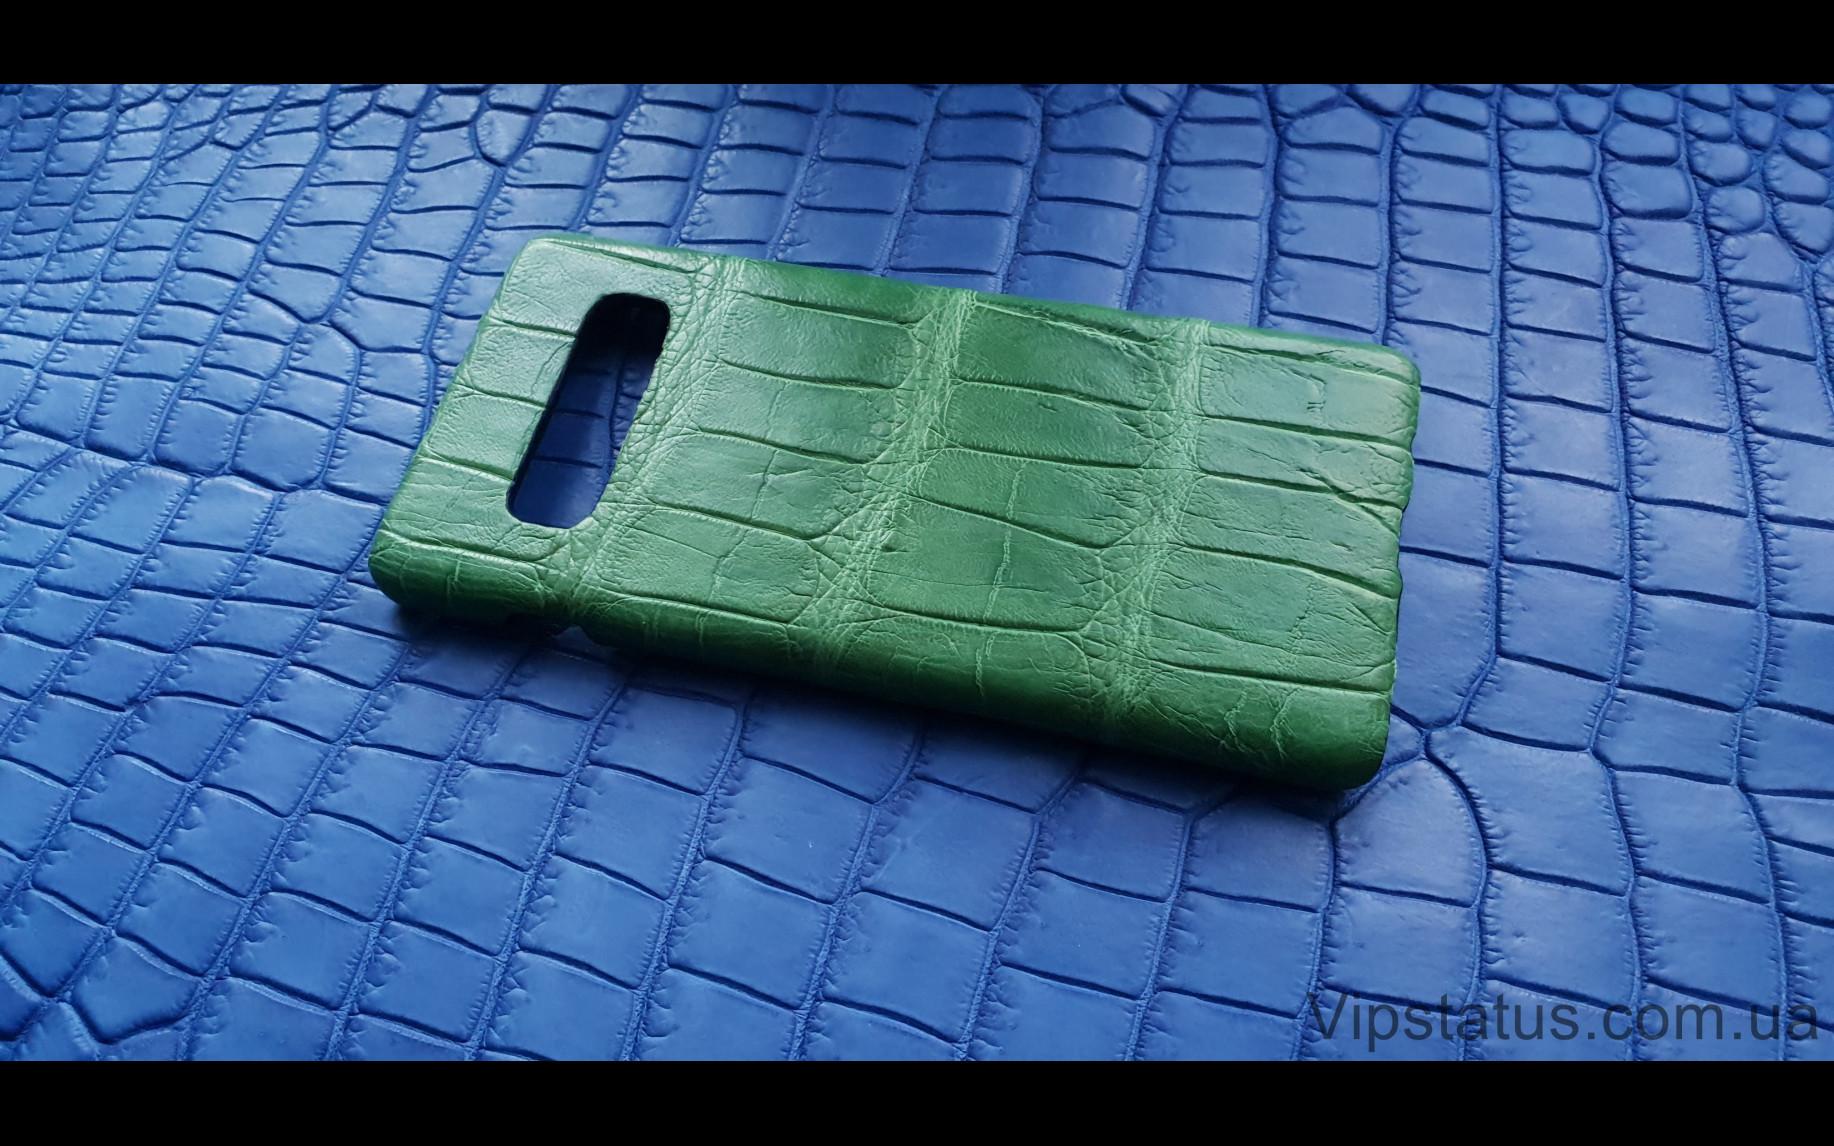 Elite Light Green Экзотический чехол Samsung Galaxy S10 Plus Light Green Exotic case Samsung Galaxy S10 Plus Crocodile leather image 2